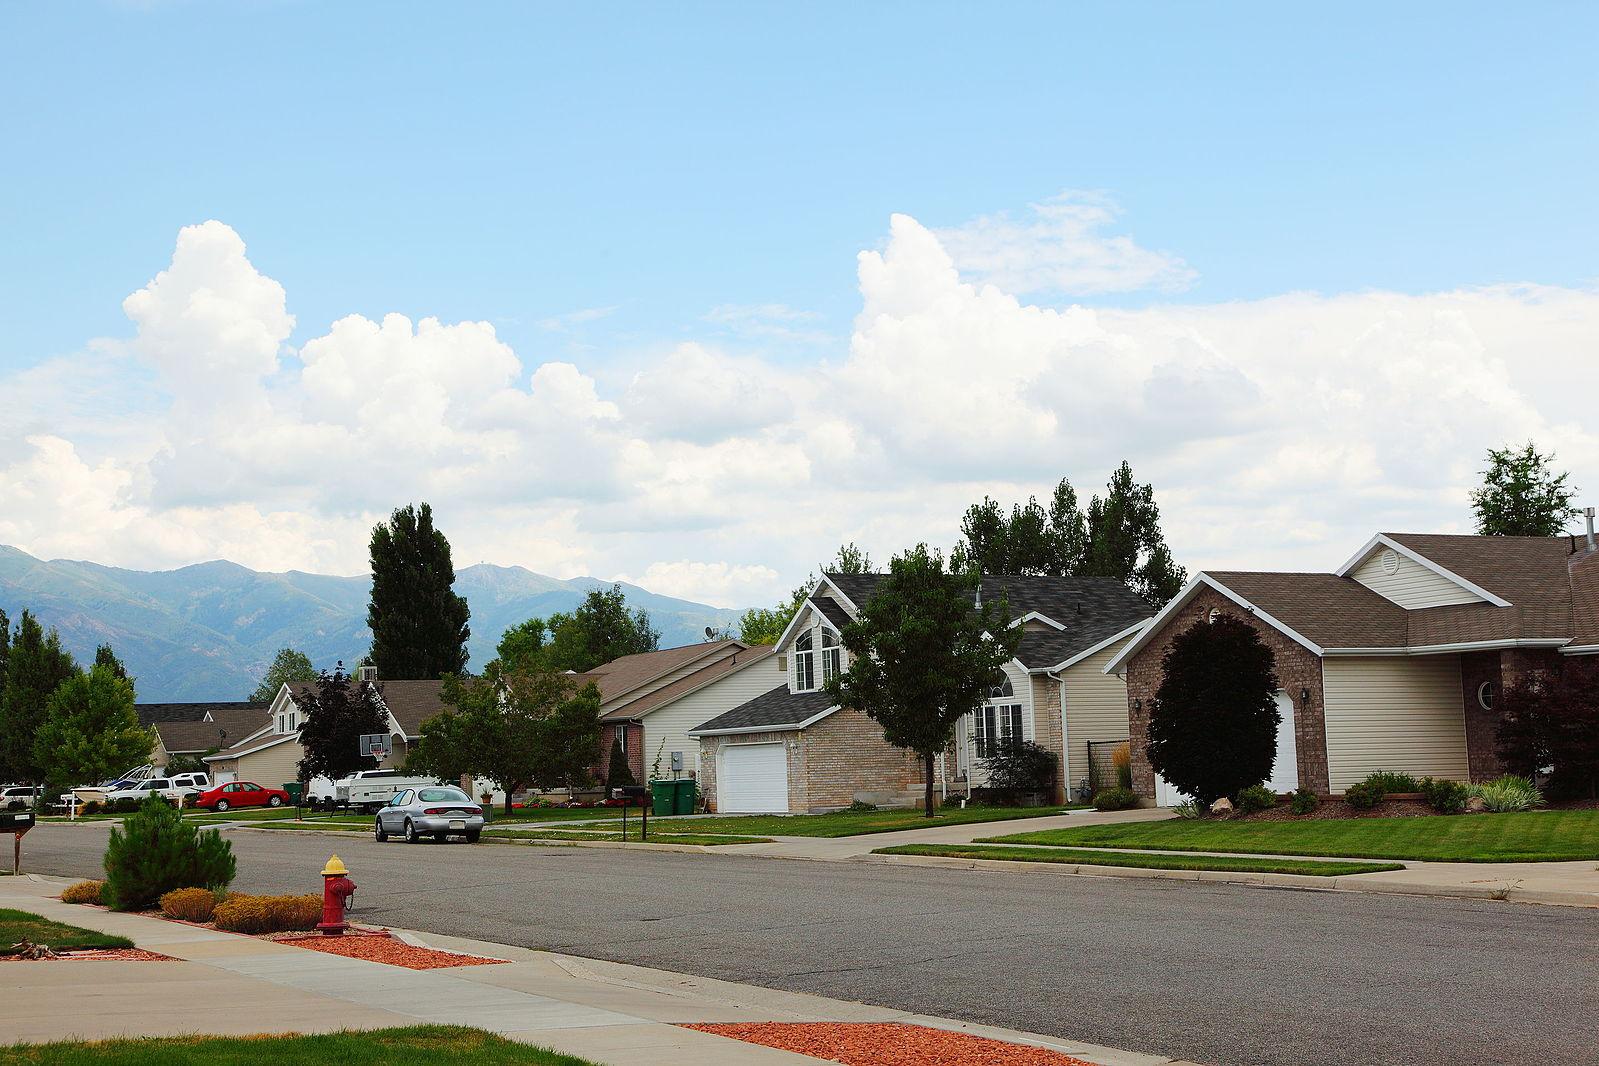 Suburban neighborhood in Layton, UT (Source:  Pink Sherbet Photography )